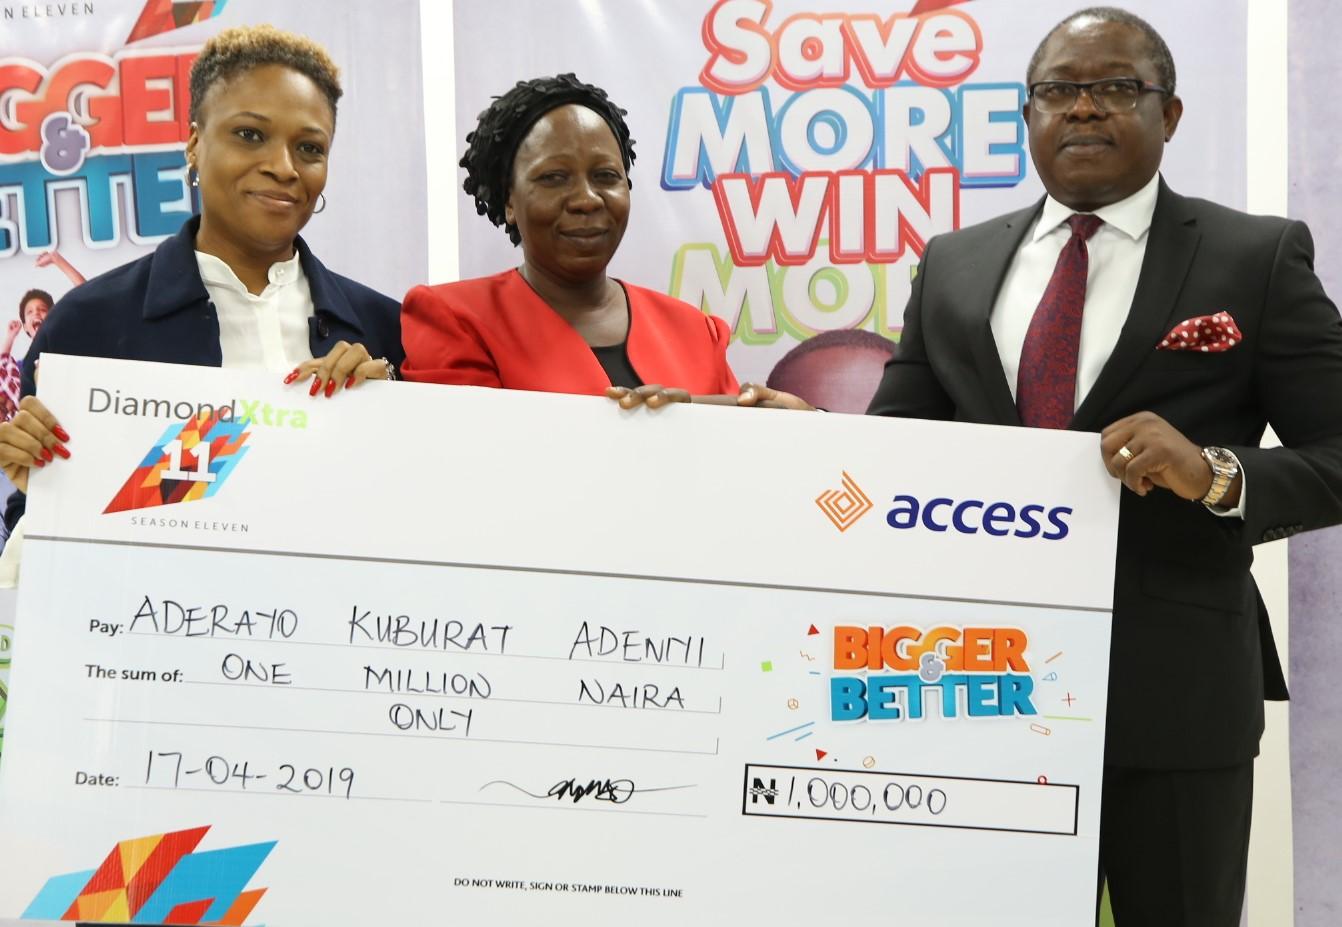 Access Bank and Diamond Bank reward winners in Diamond Xtra monthly draw